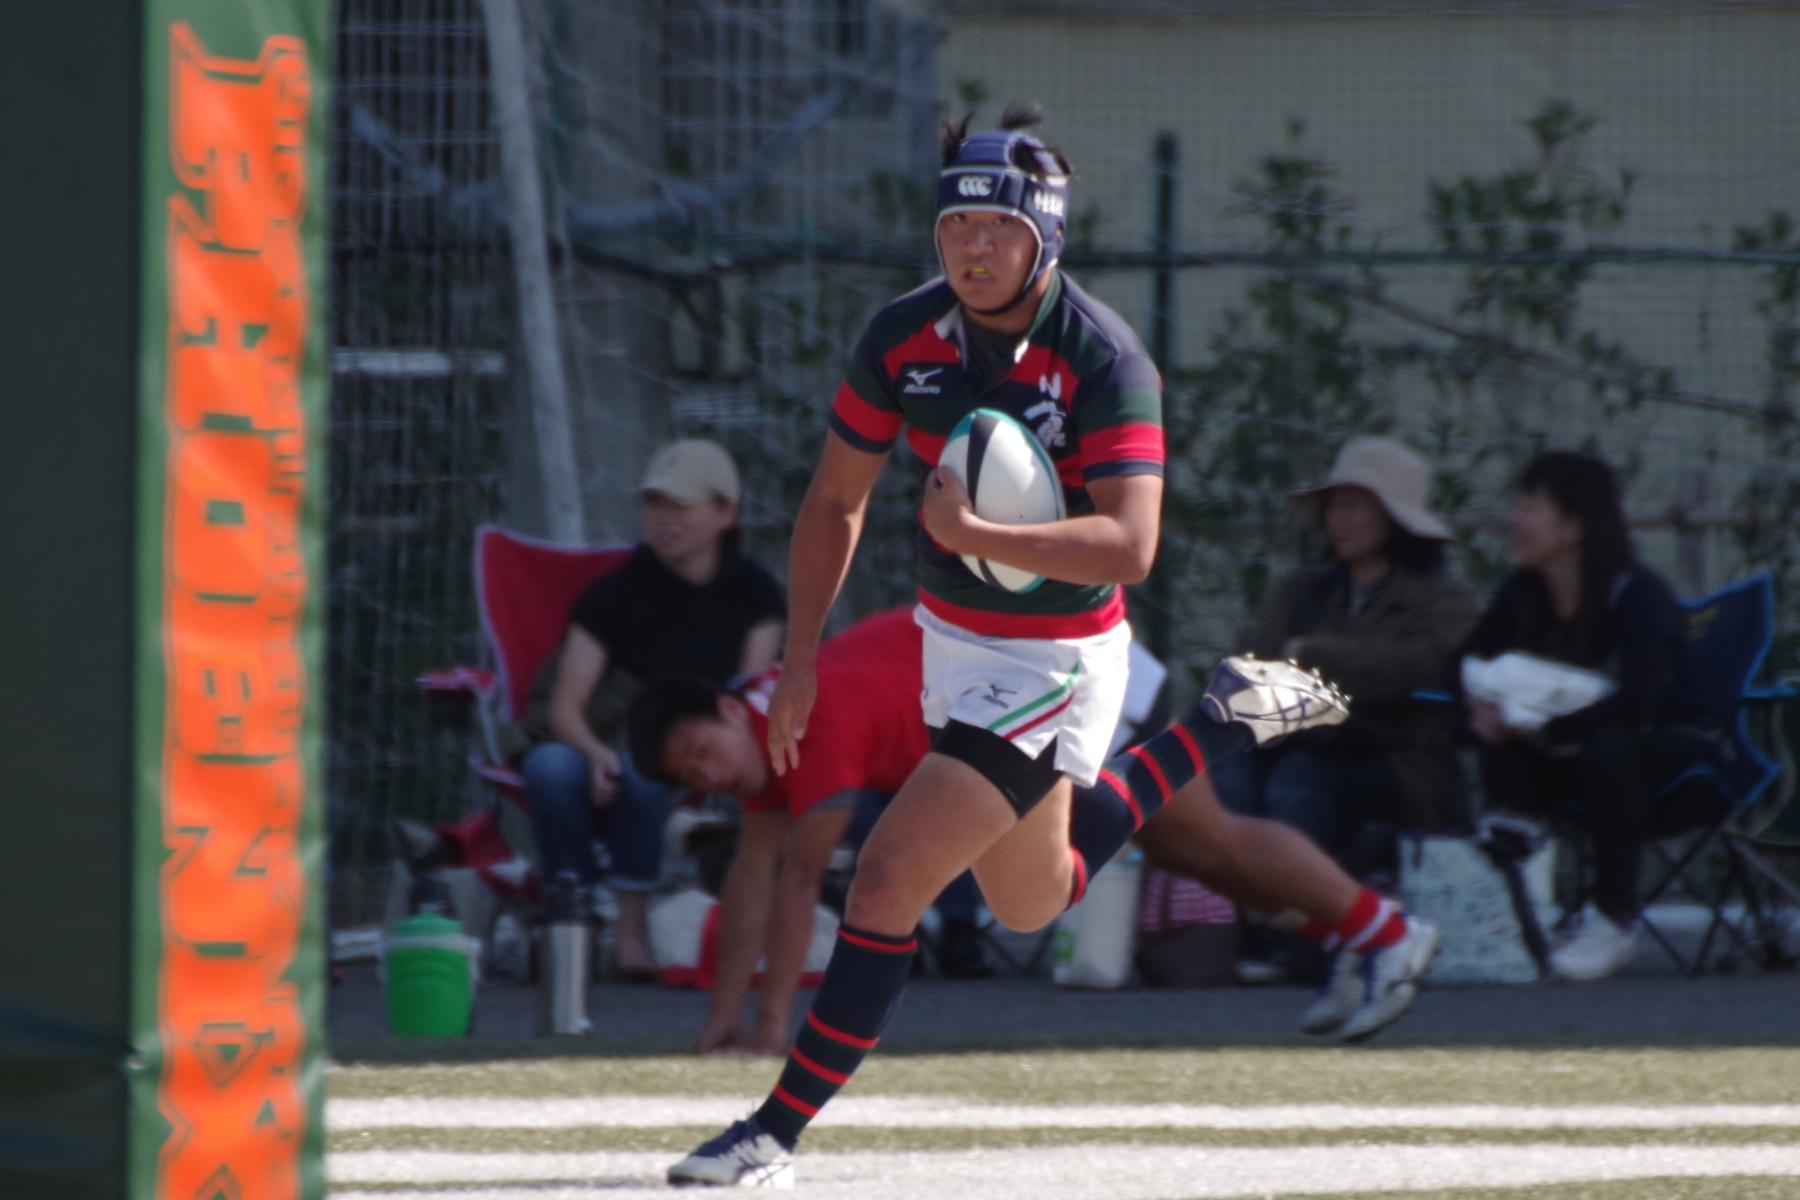 http://kokura-rugby.sakura.ne.jp/181021_124504_0635.jpg